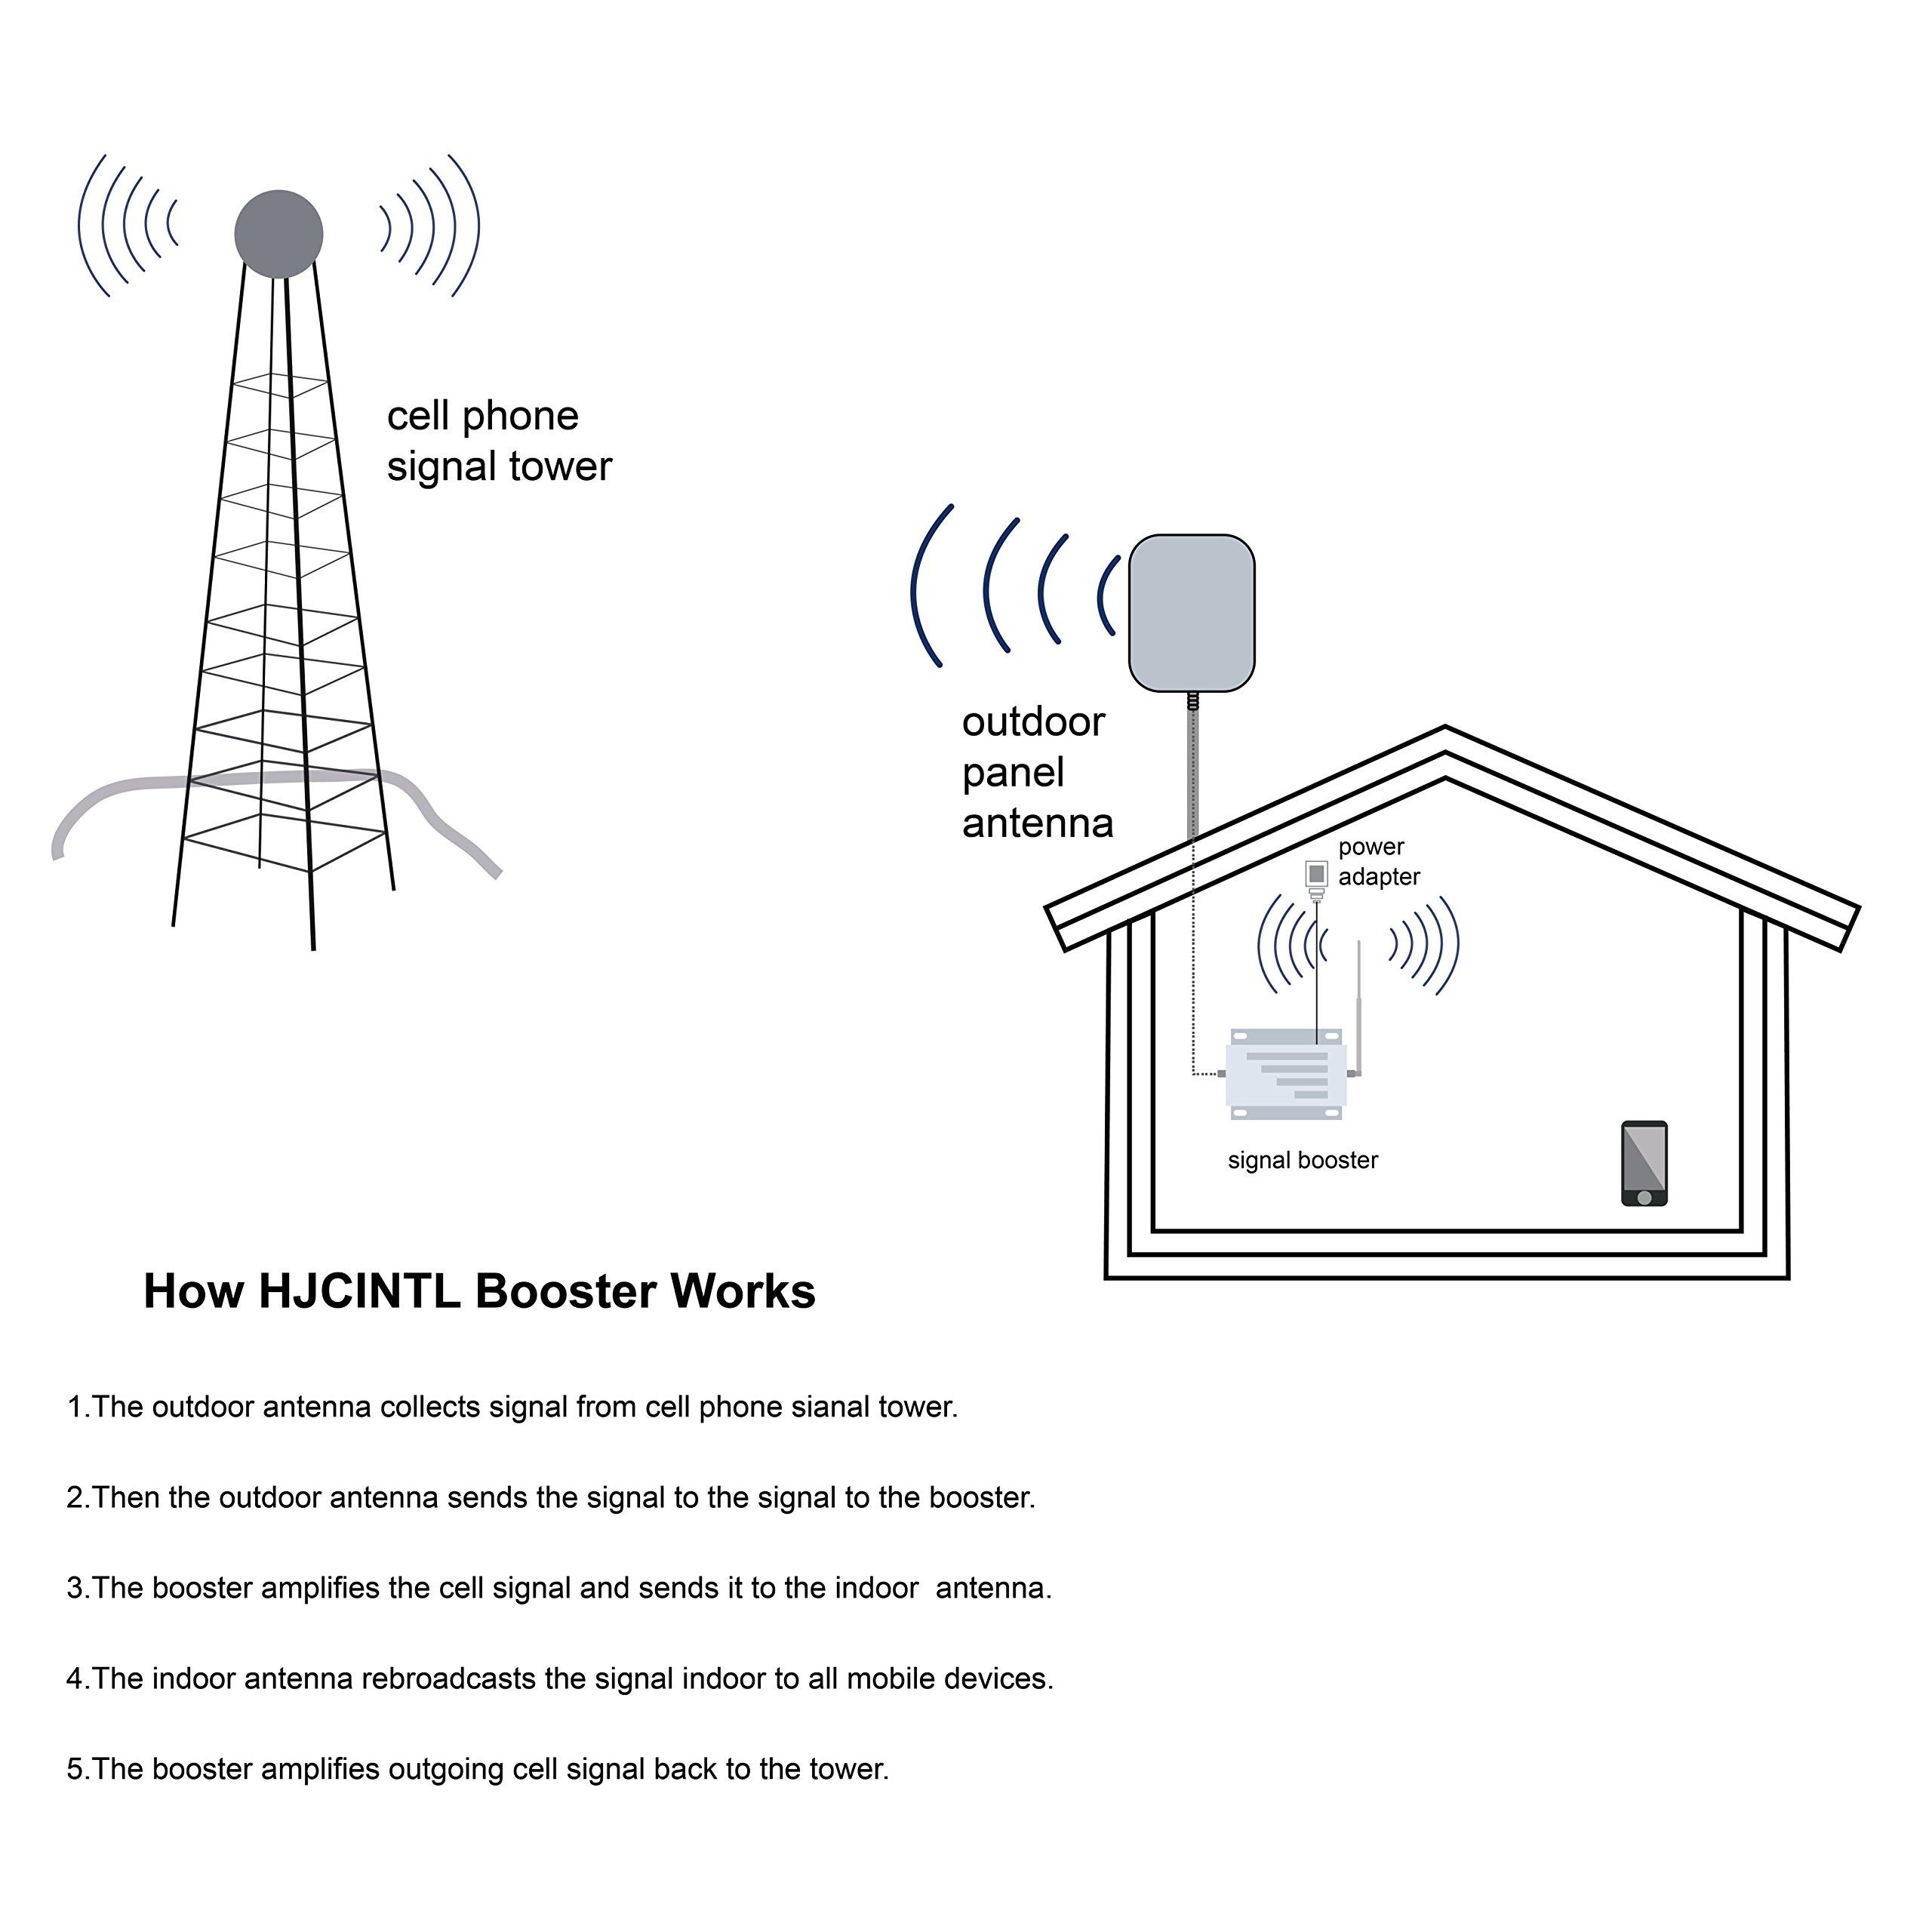 ATT T-Mobile Cell Phone Signal Booster 4G LTE Cell Signal Booster HJCINTL 700MHz Band 12/17 FDD Home Mobile Phone Signal Booster Amplifier Cover- 2500sq ft by HJCINTL (Image #8)